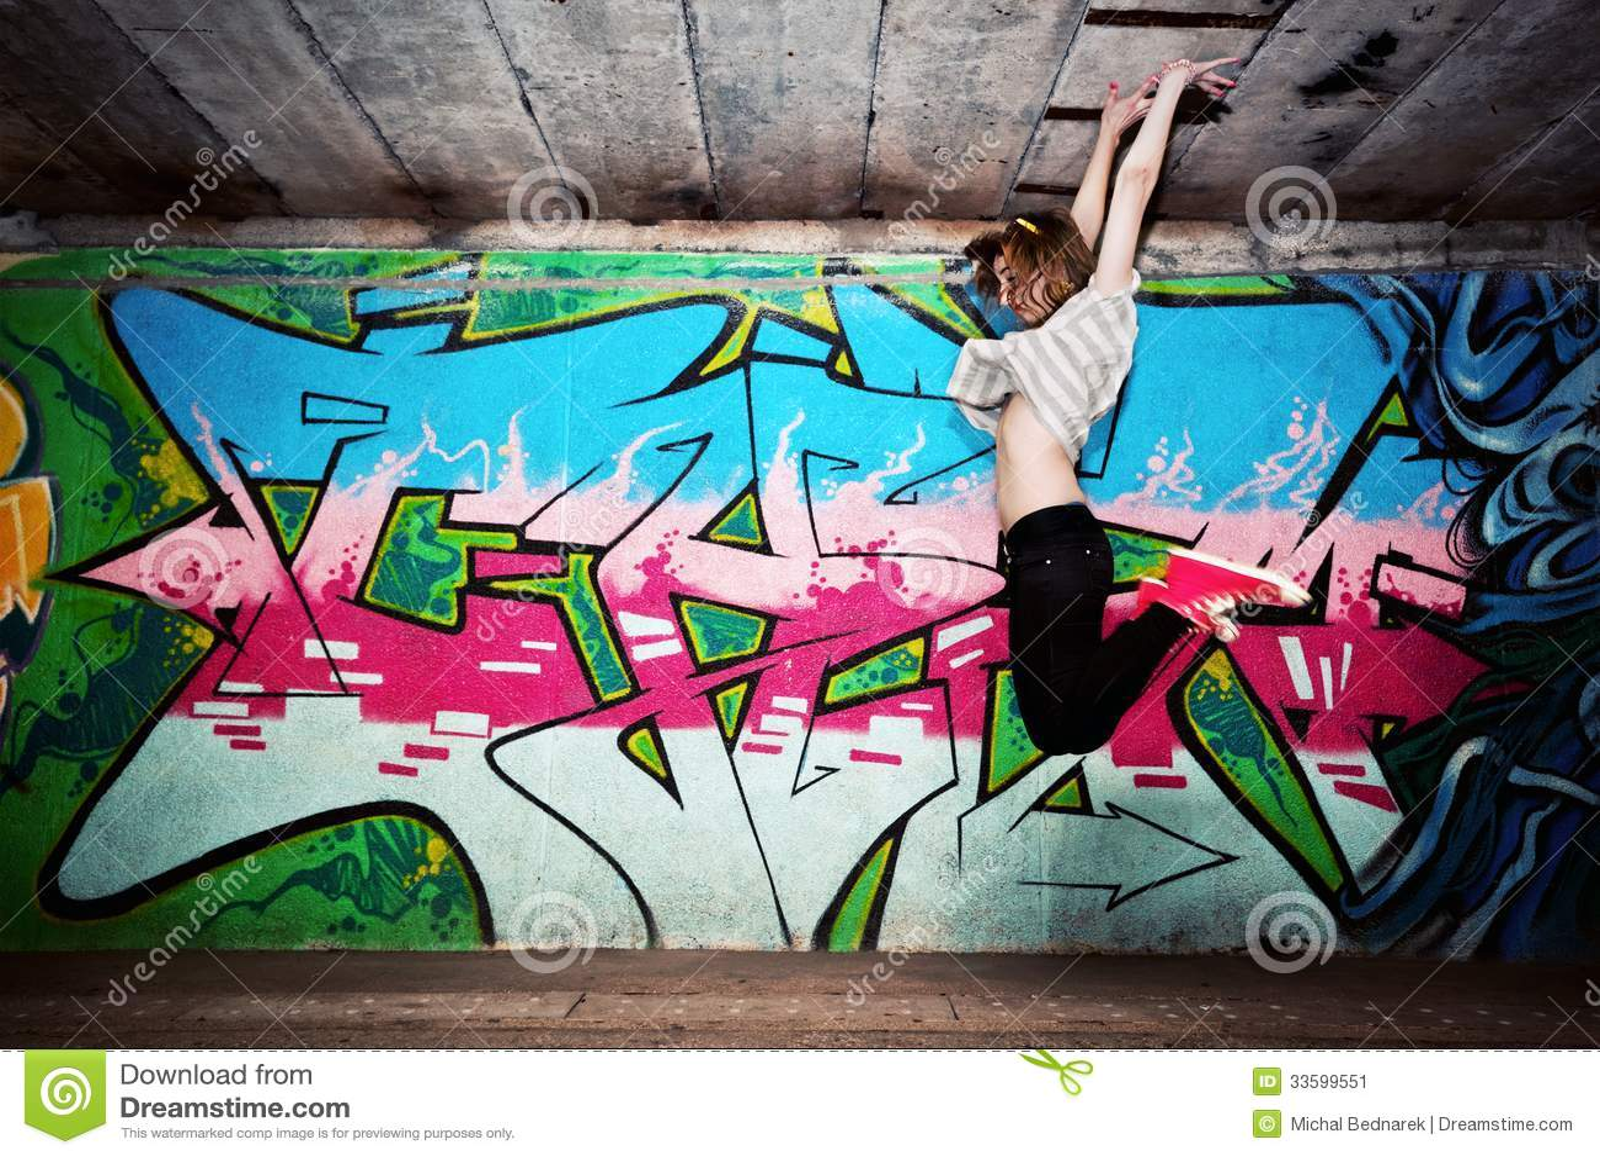 Идеи для фото с граффити